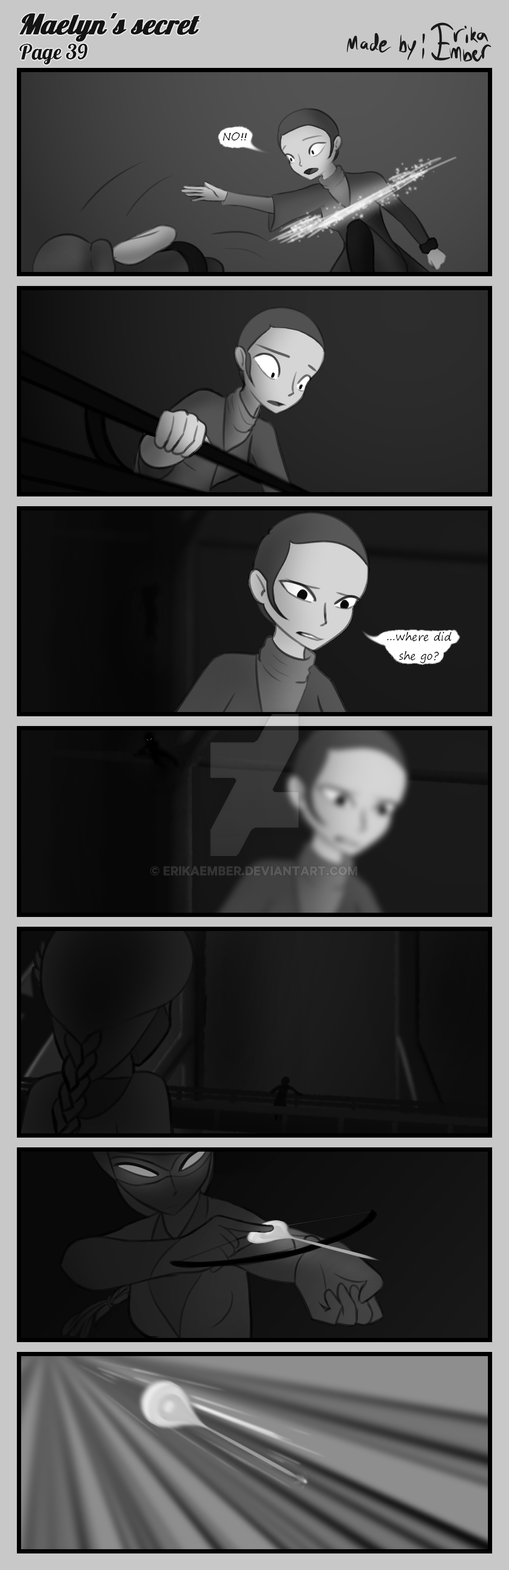 Maelyn's Secret - Page 39